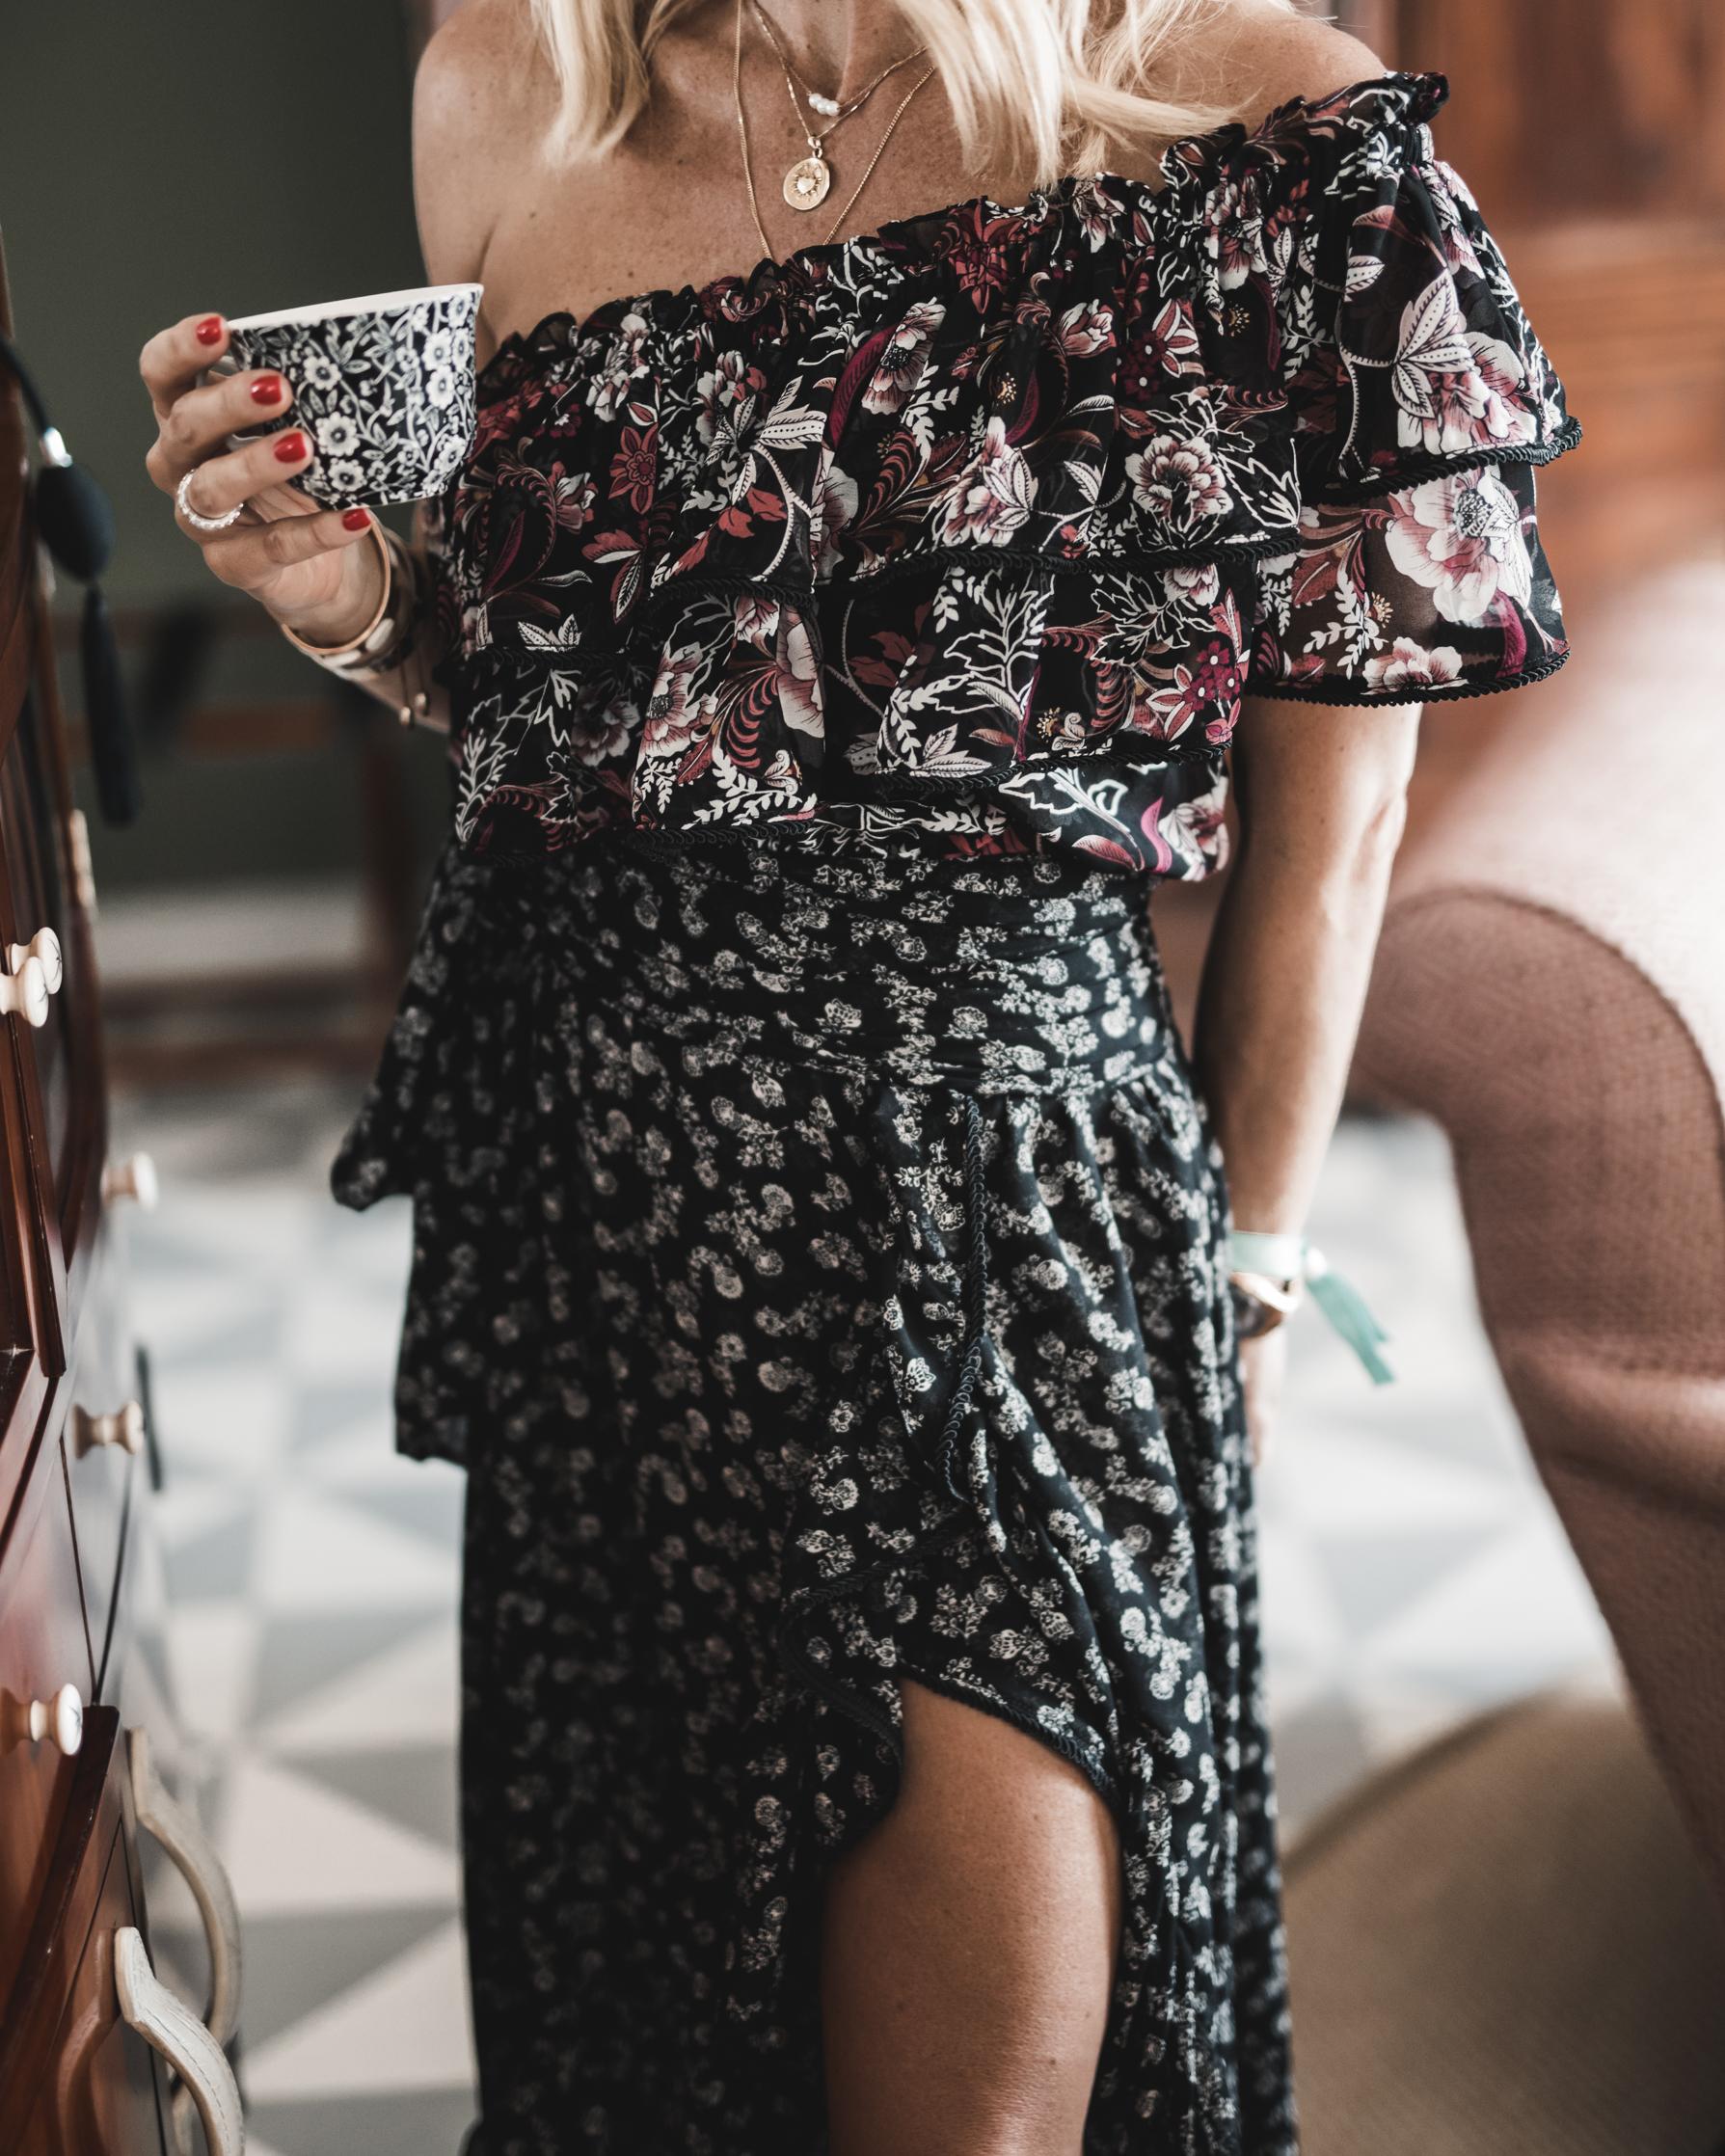 julie with cup.jpg